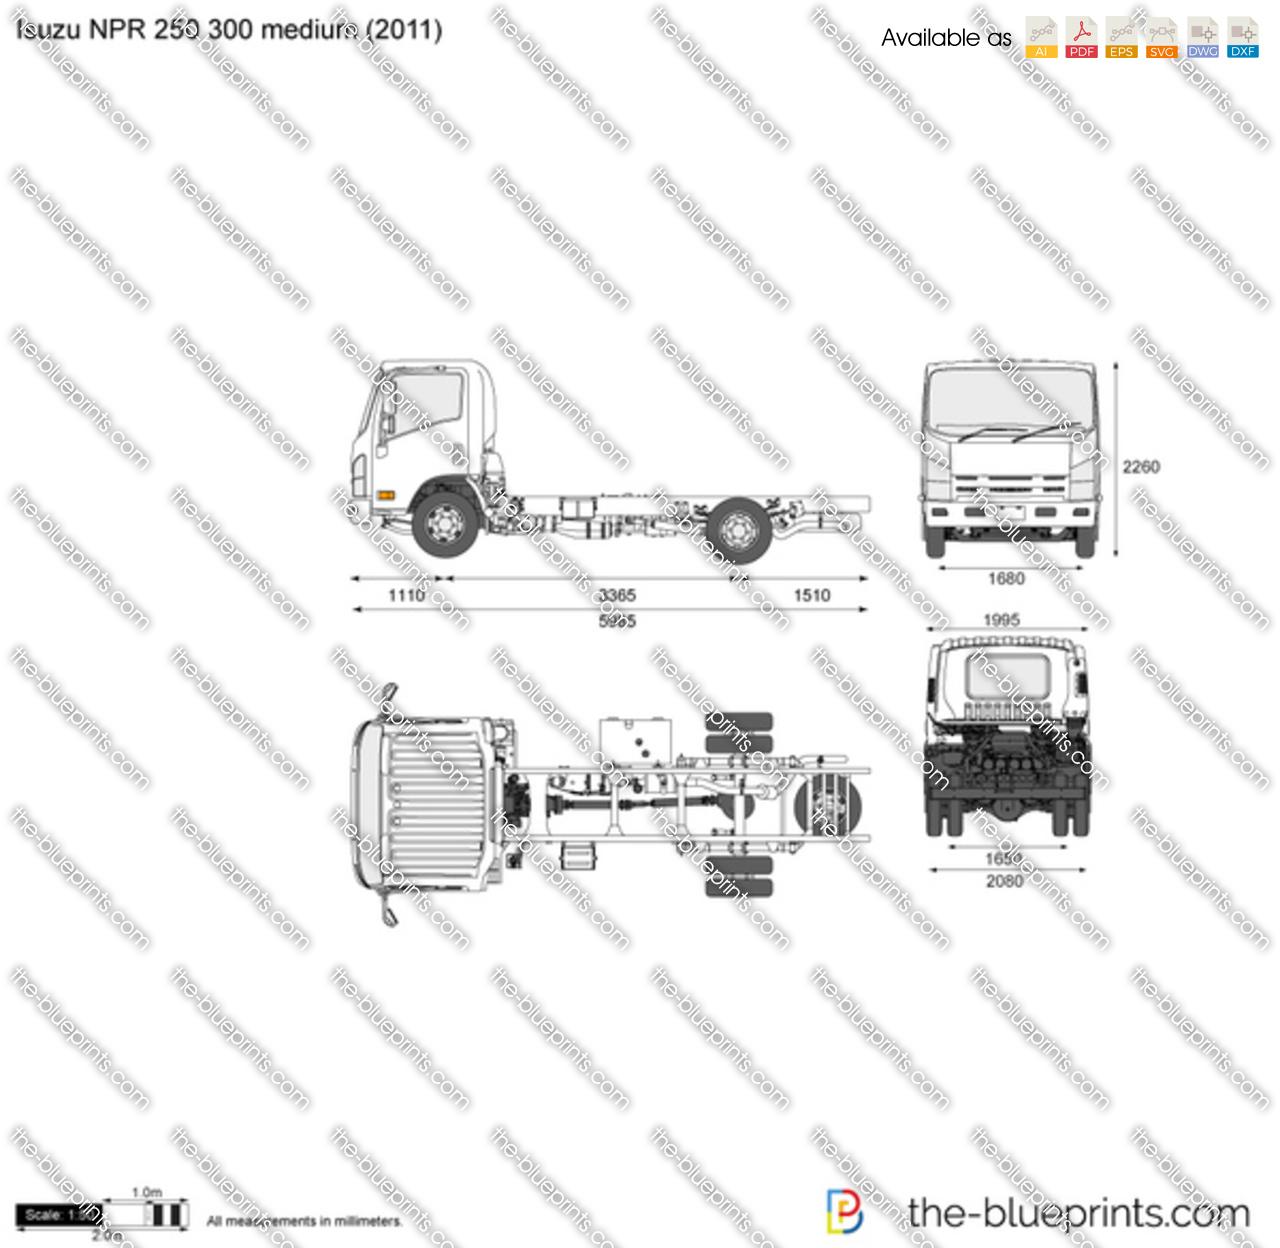 Isuzu NPR 250 300 medium vector drawing